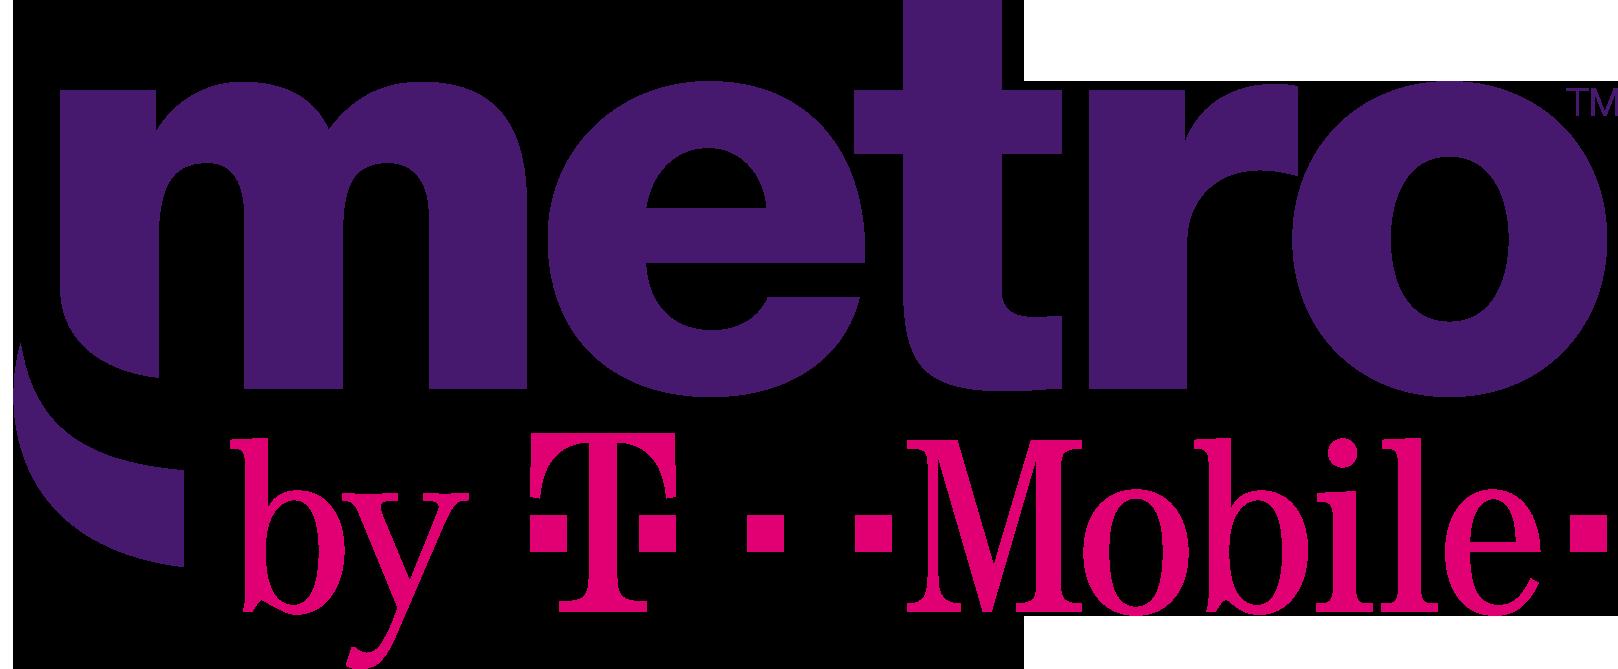 Metro_TMobile_logo.png